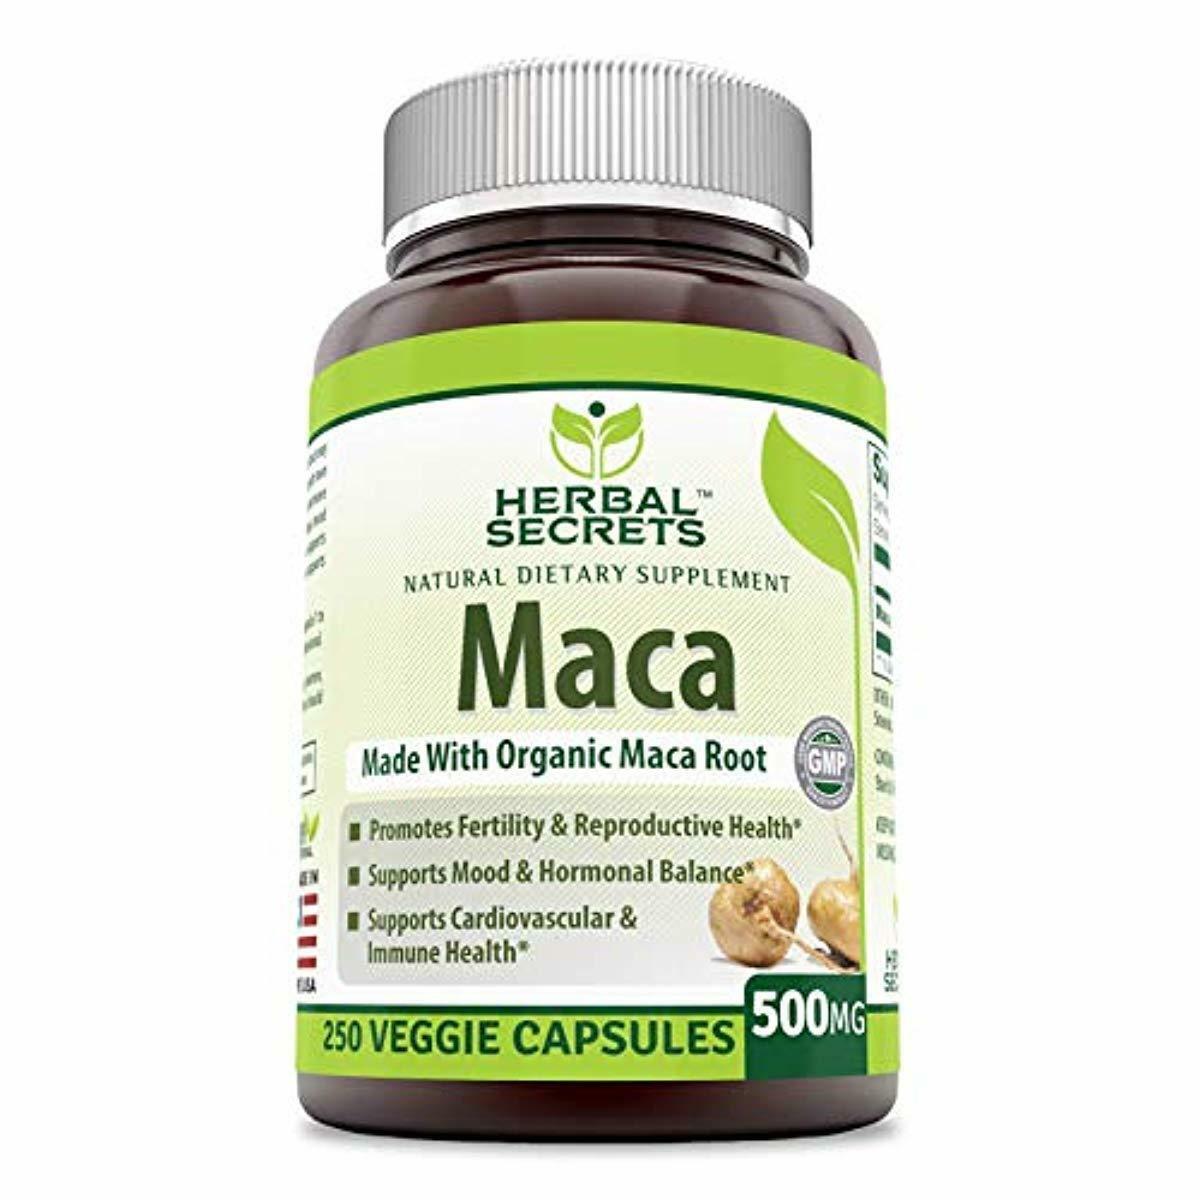 Herbal Secrets Maca 500 Mg 250 Veggie Capsules  - Supports R